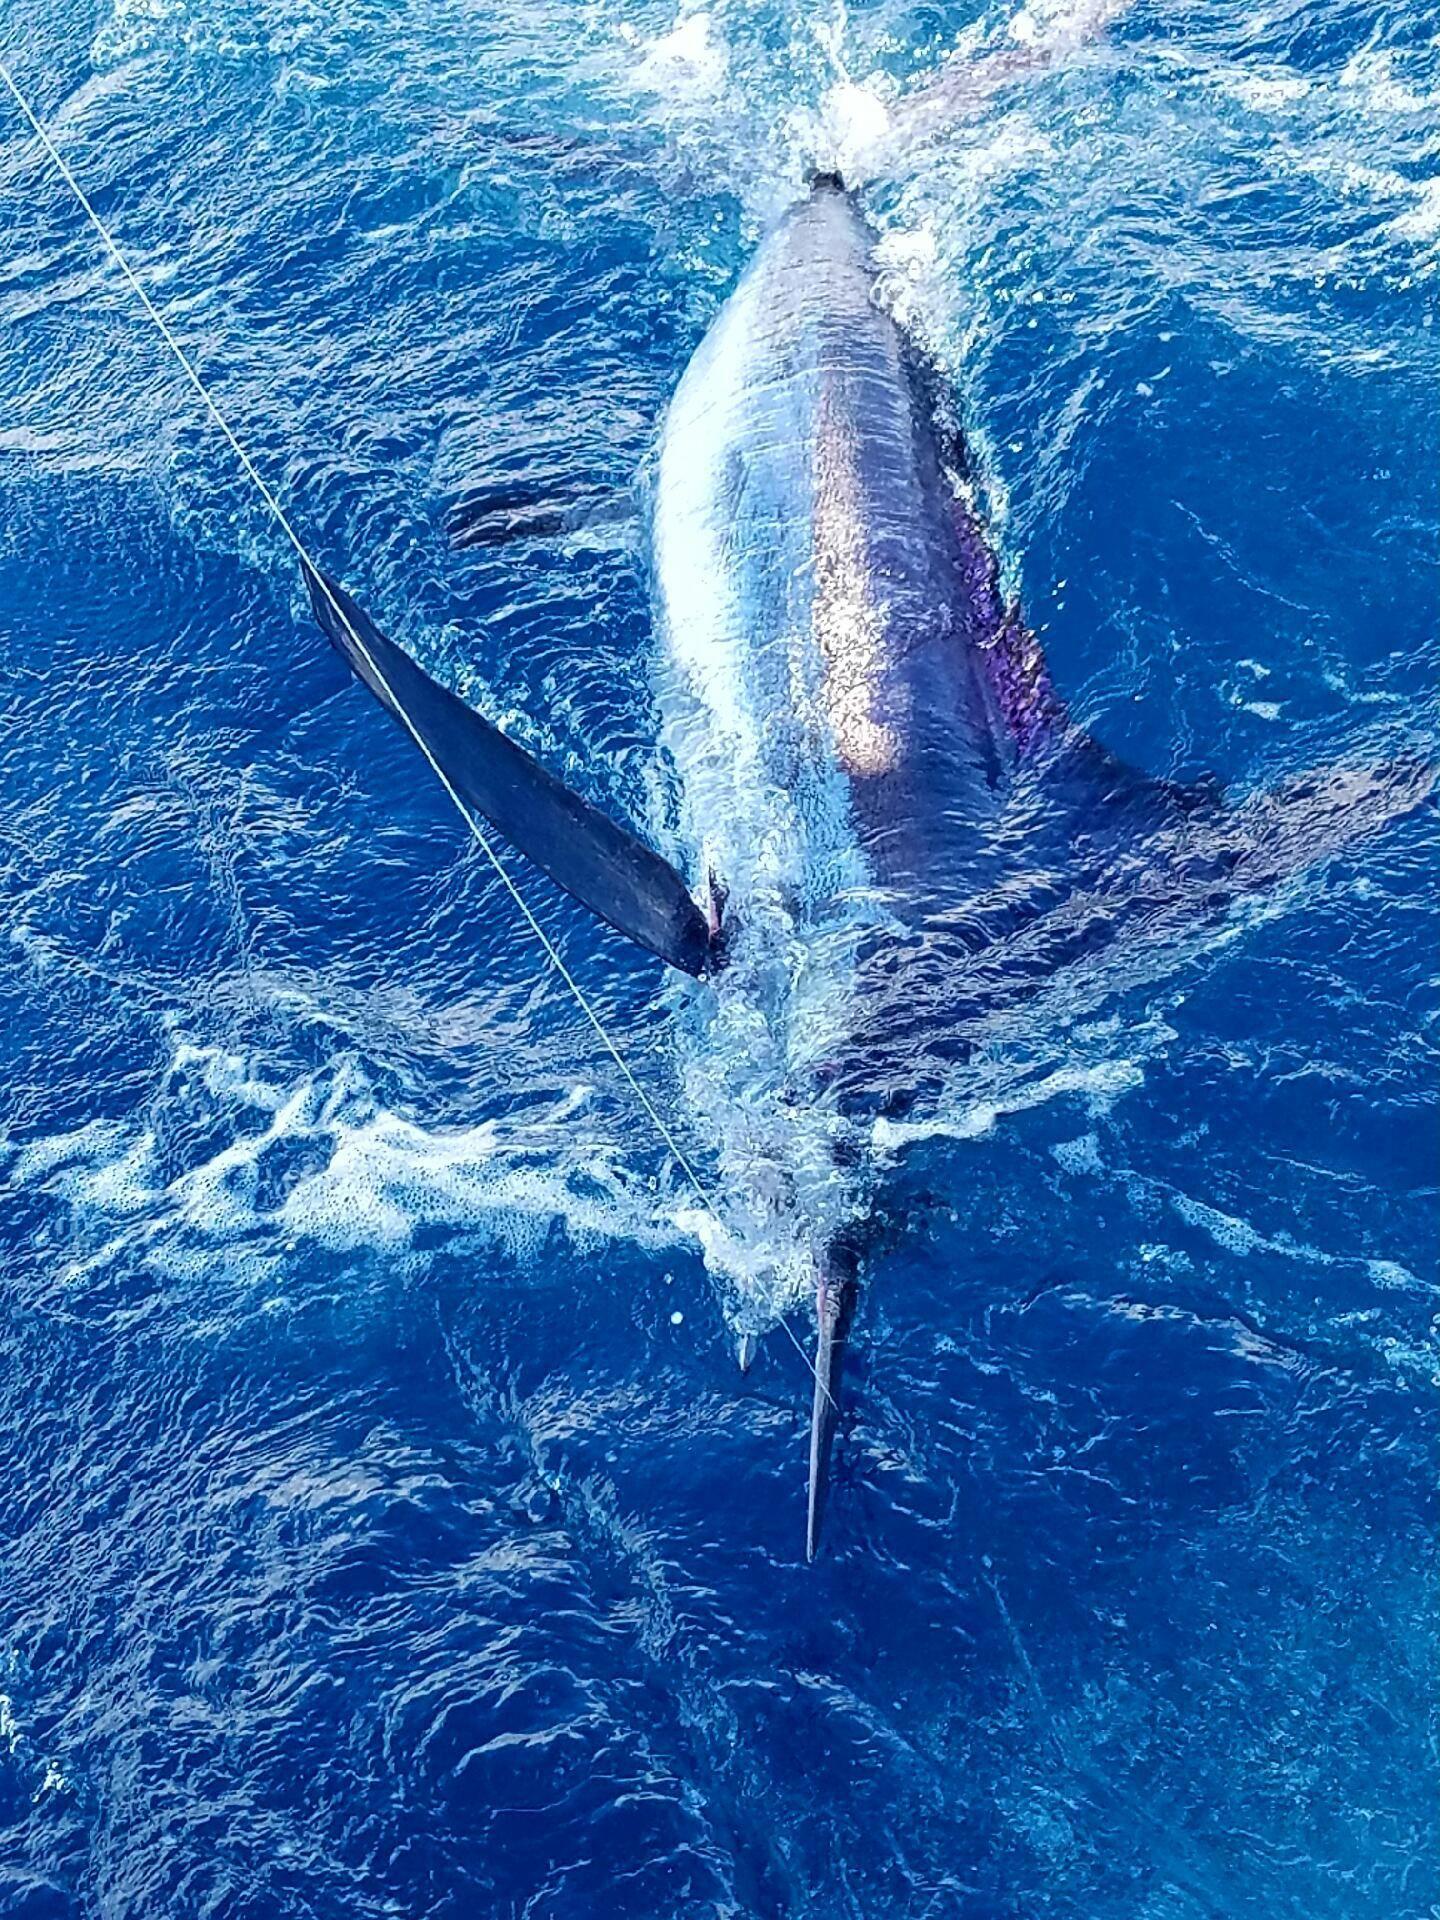 3 Big Game Trolling Saltwater FISHING LURE Tuna Marlin Moldcraft Styl Blue Lot